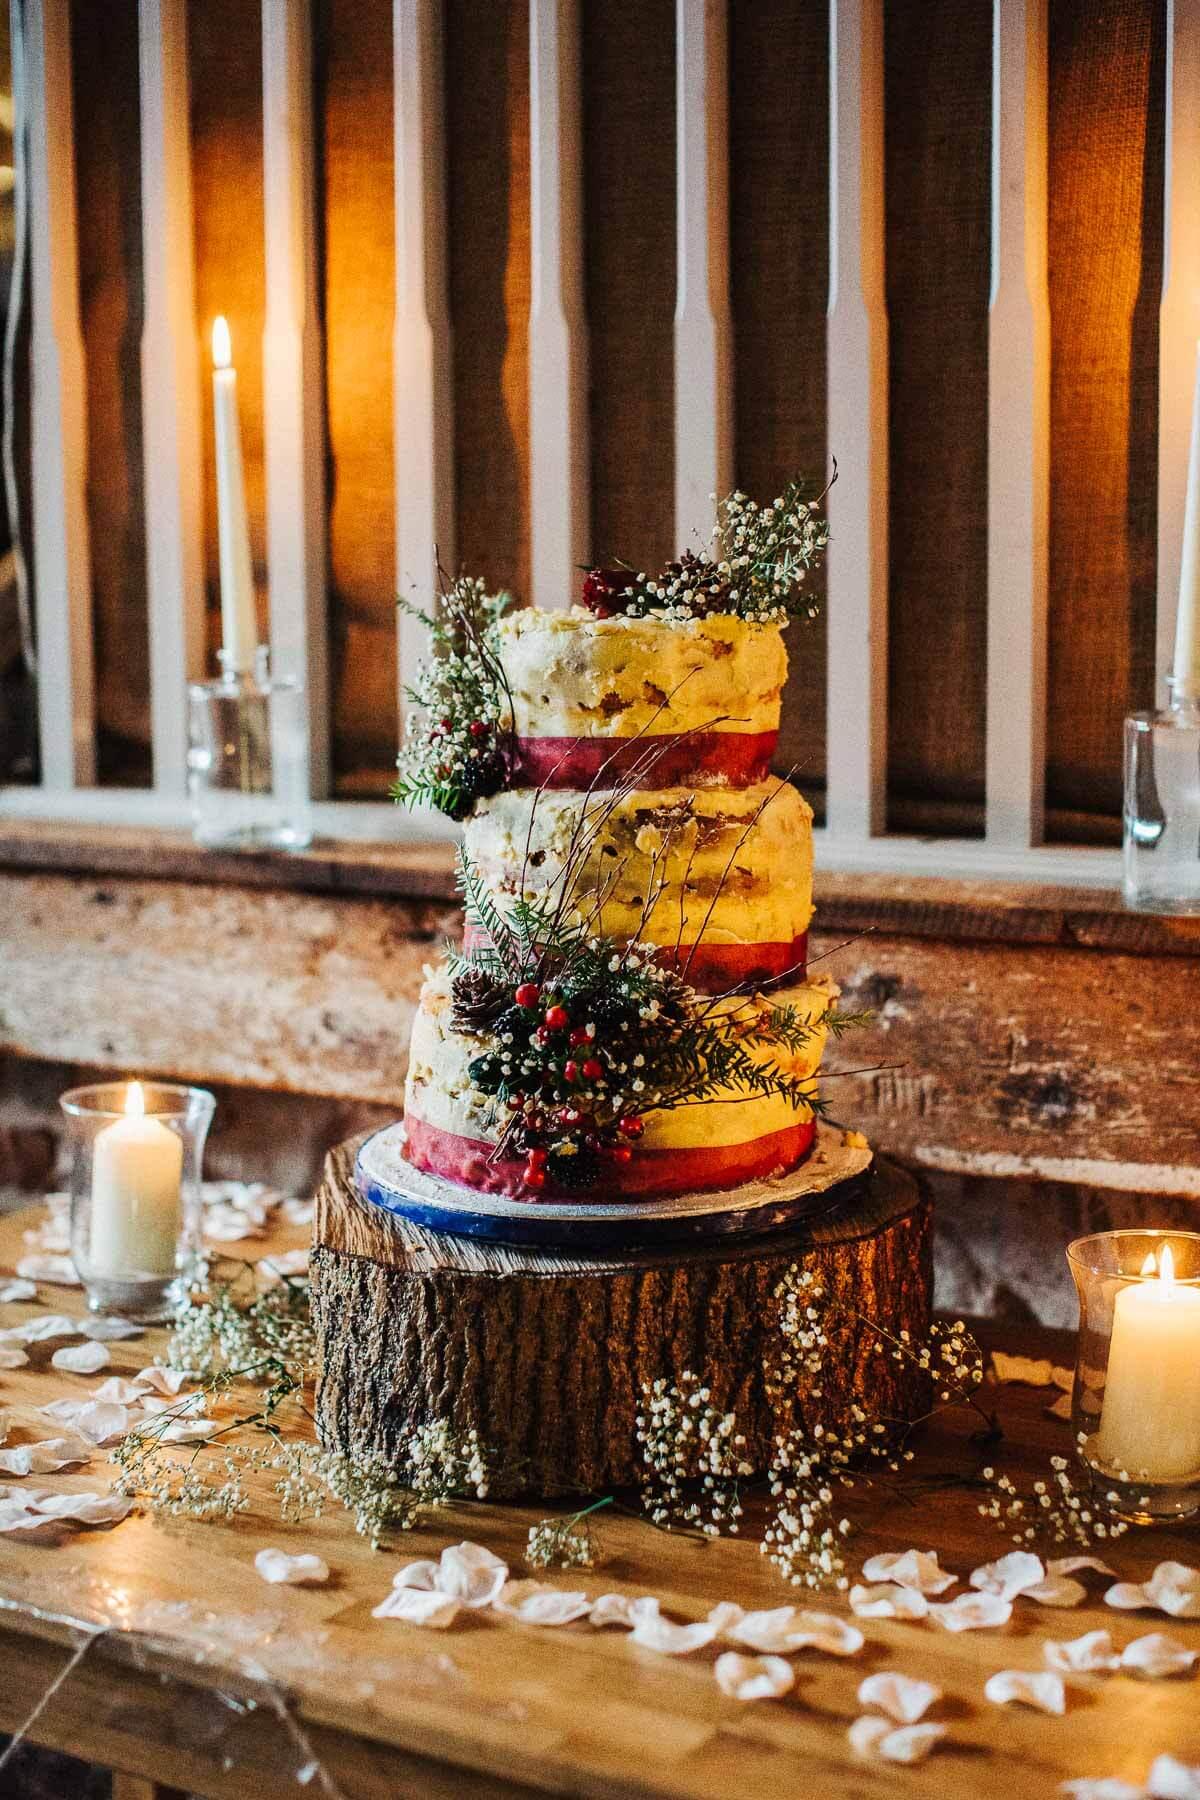 Winter wedding cake with berries